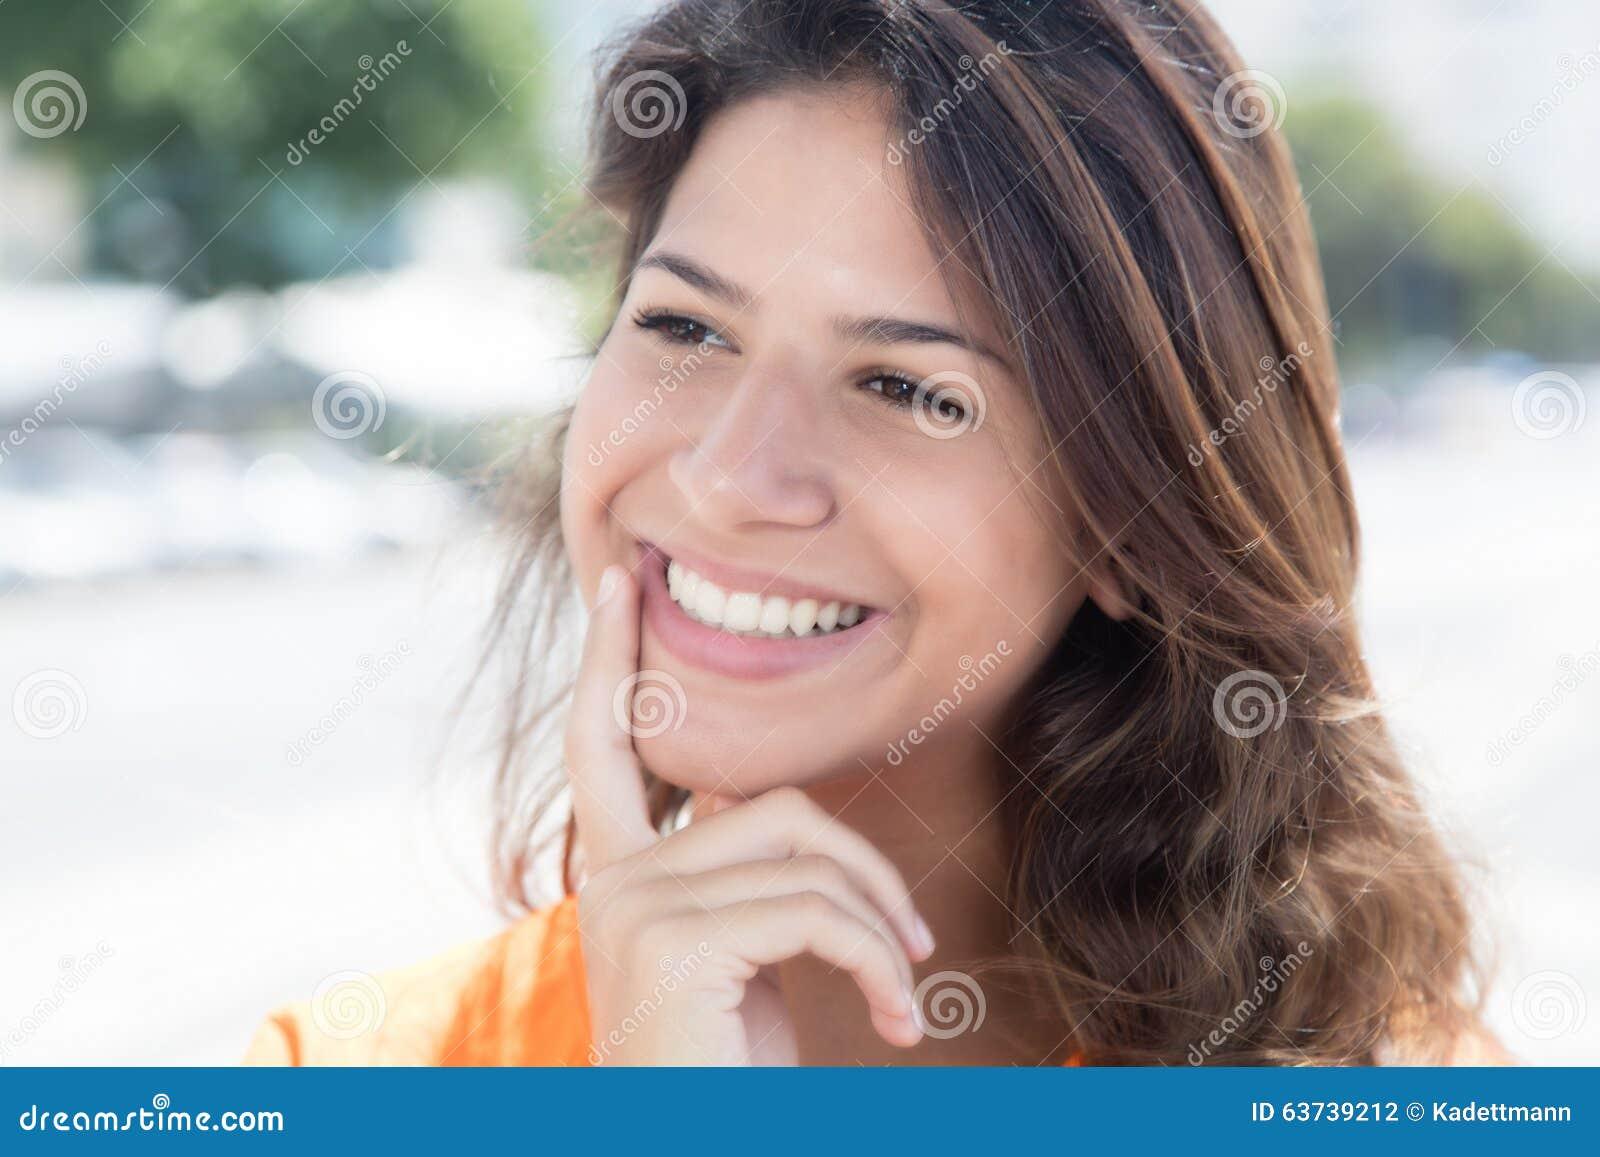 Lucky caucasian woman in a orange shirt